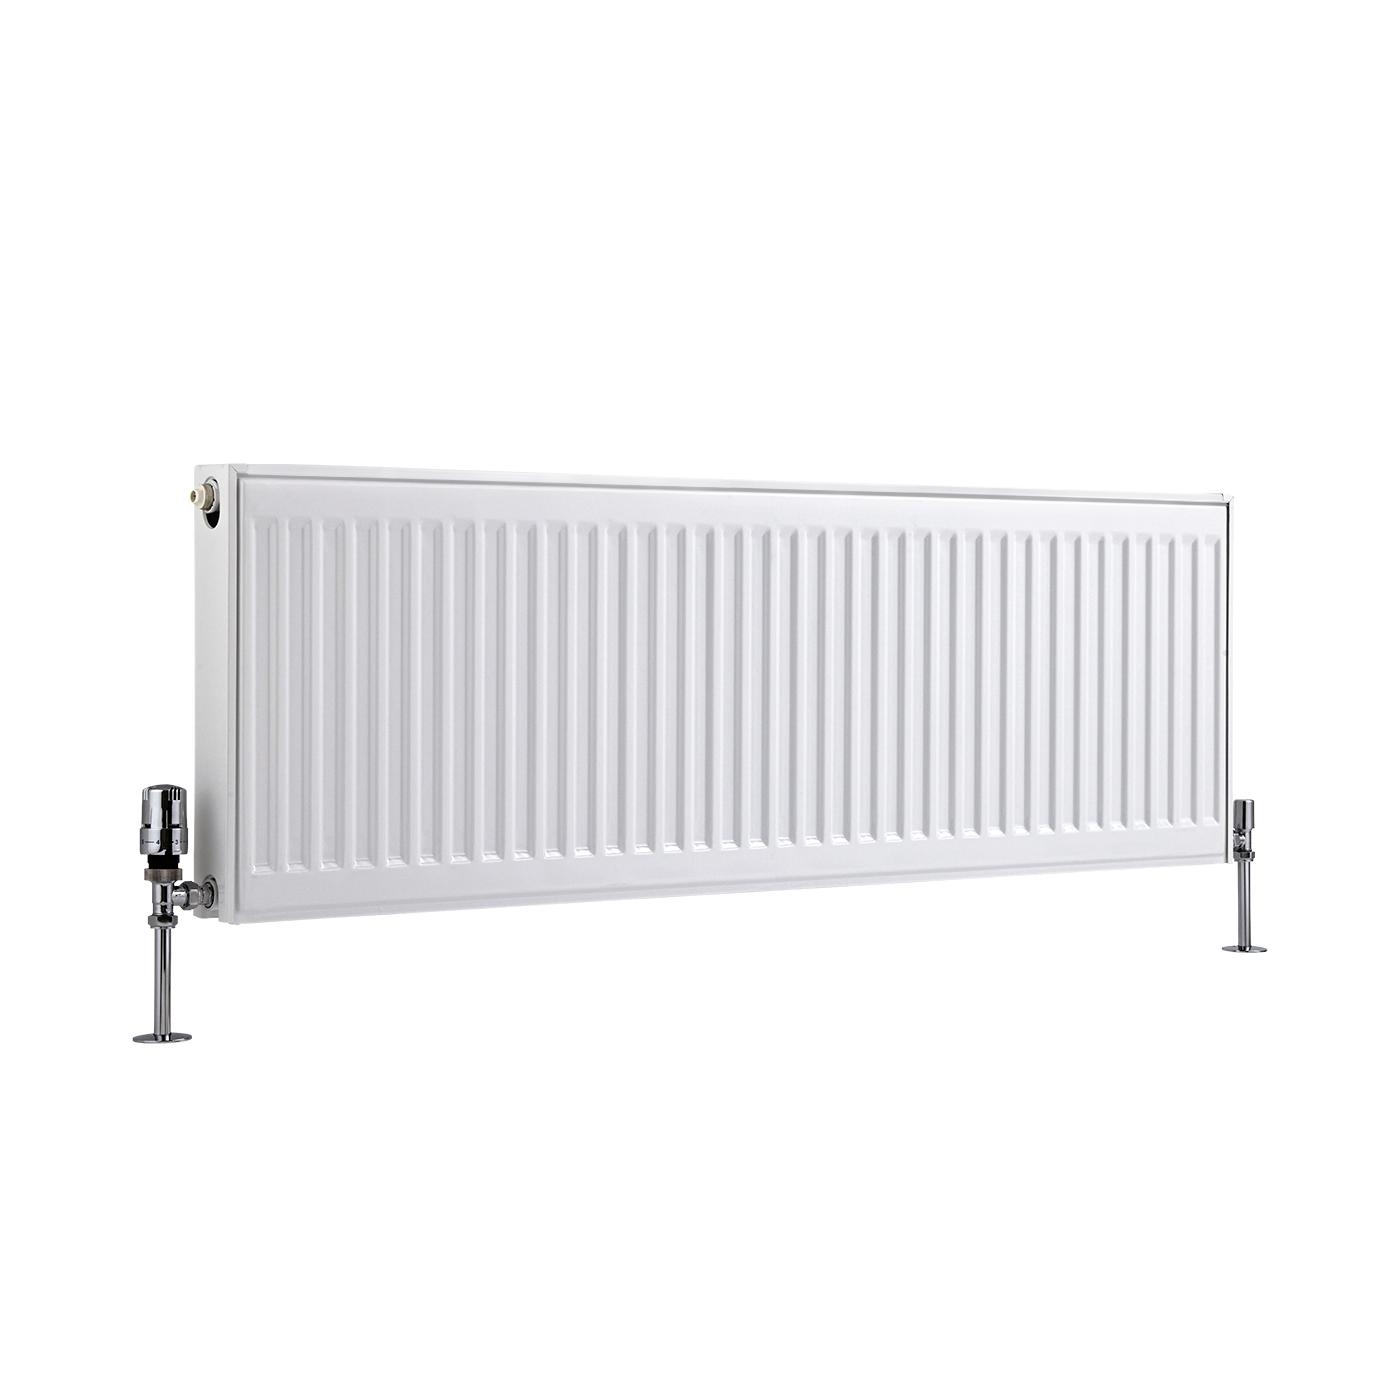 Radiateur À Panneaux Type 21 Horizontal Blanc Eco 40cm x 120cm x 7,3cm 1147 Watts